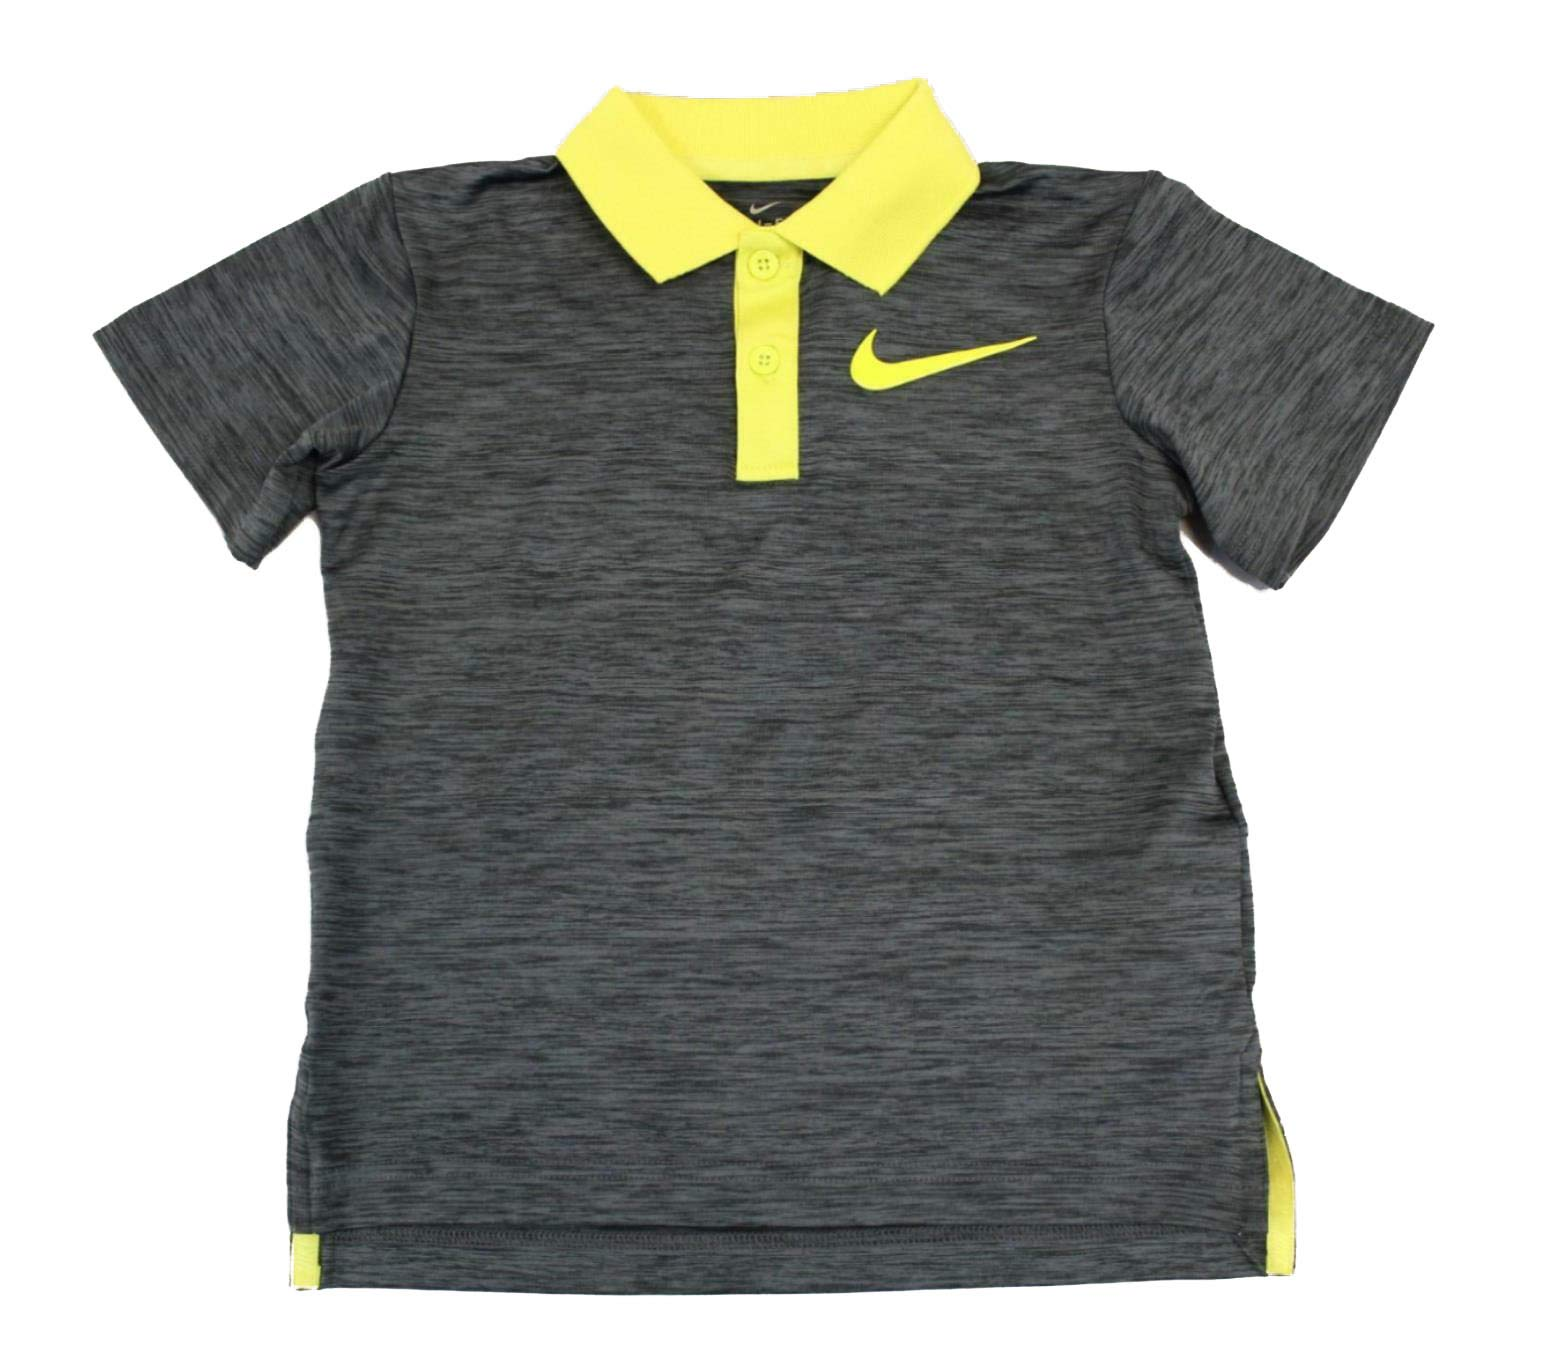 Nike Boys' Short Sleeve Polo Shirt (Anthracite(86C217-G2Y)/Yellow, 4)